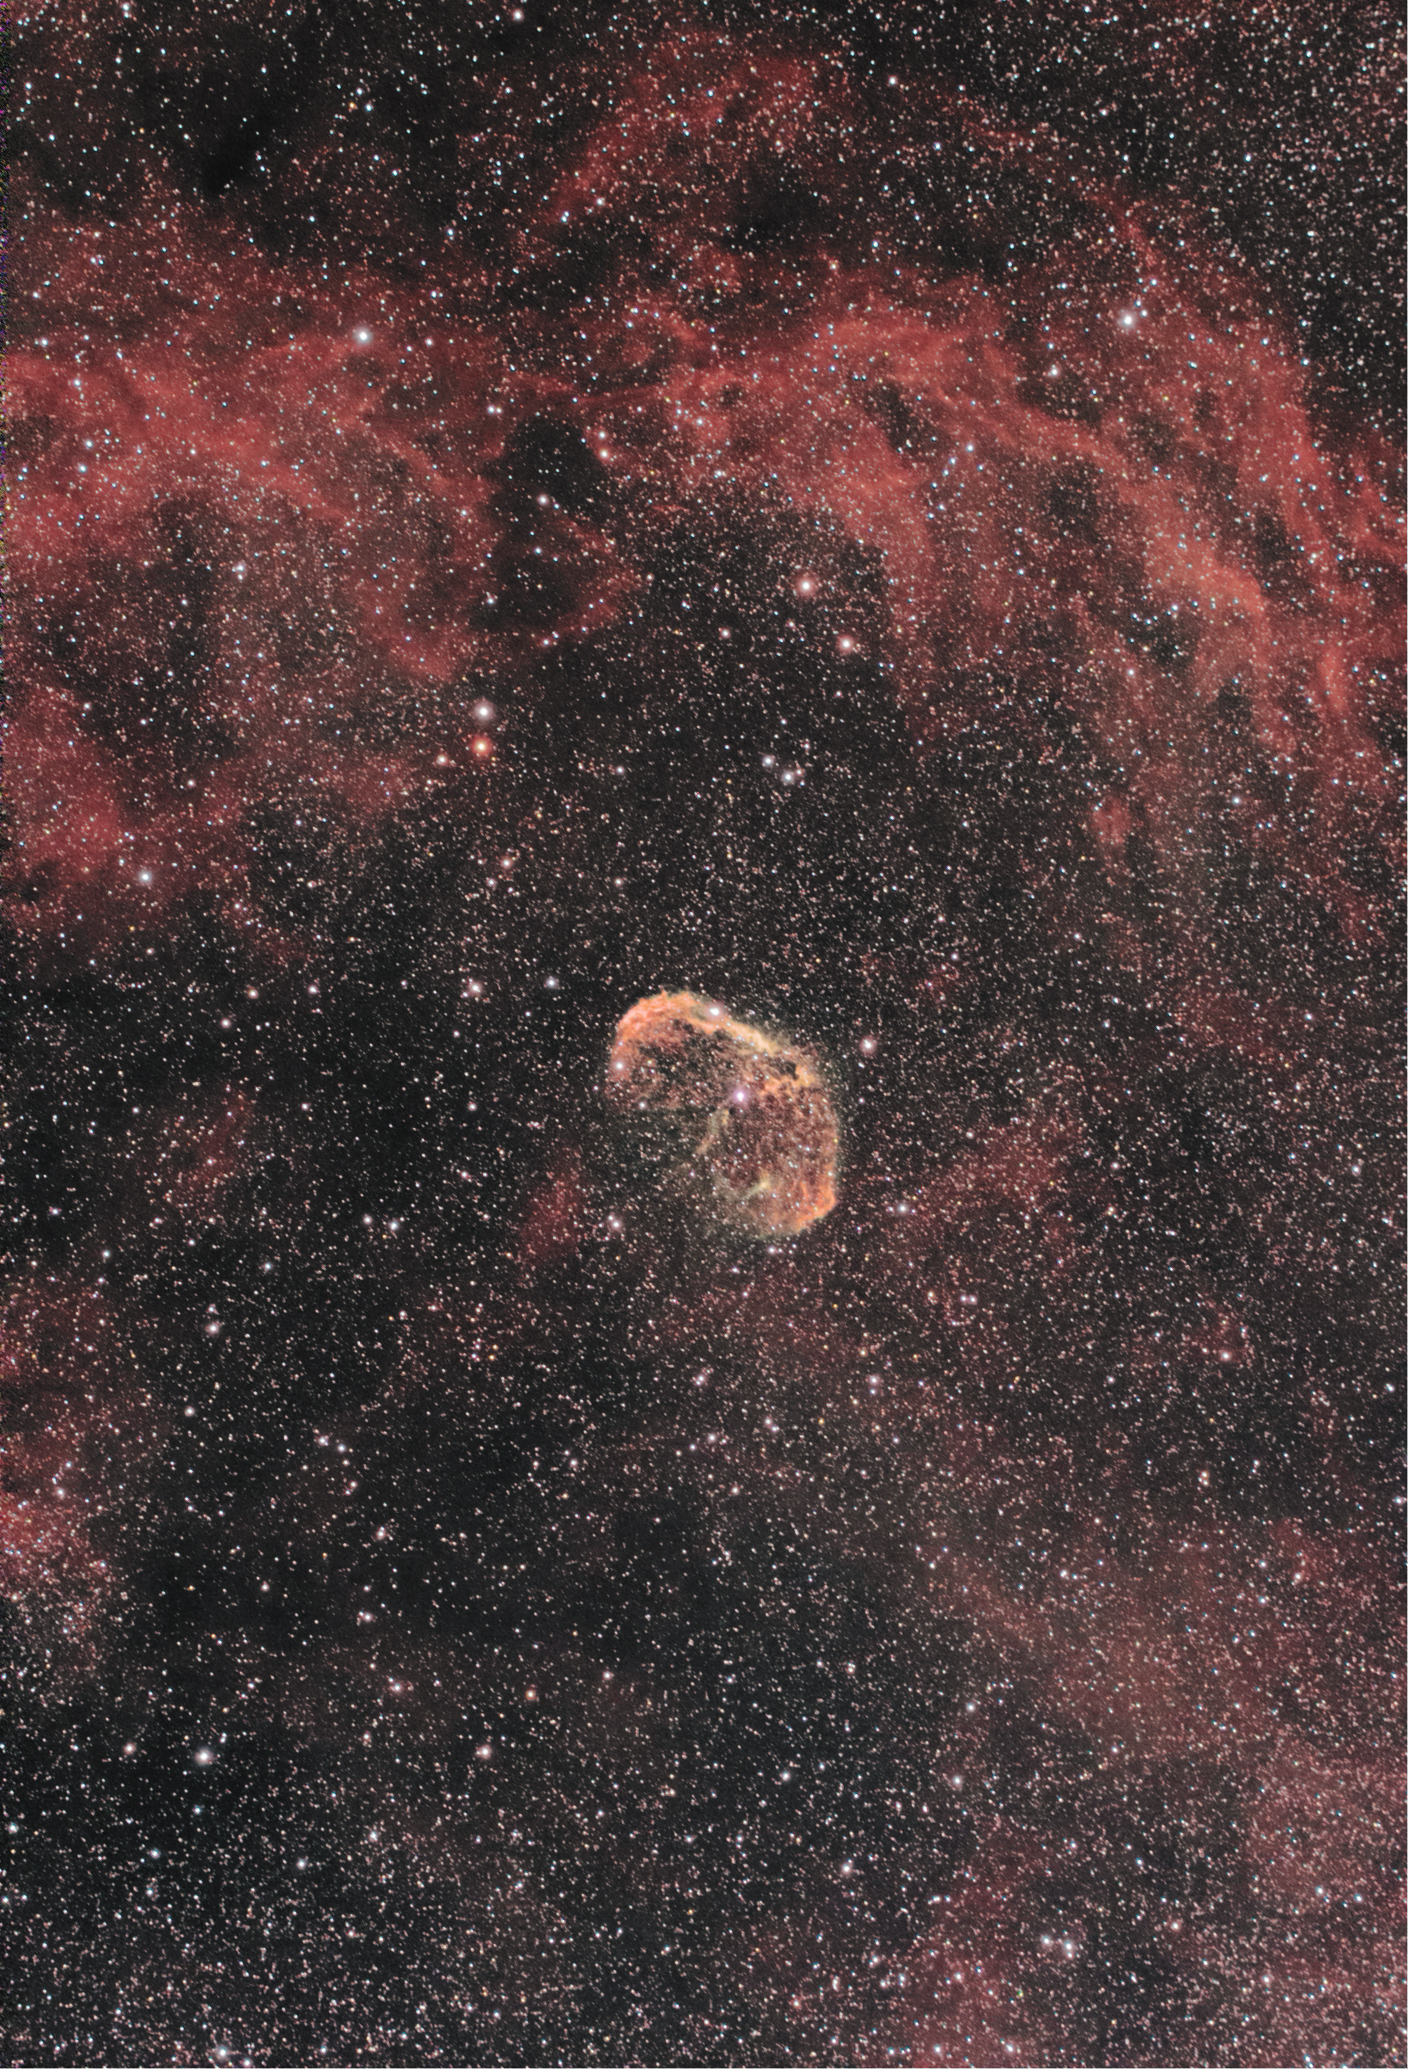 20190907-NGC6888-Crescent-Nebula